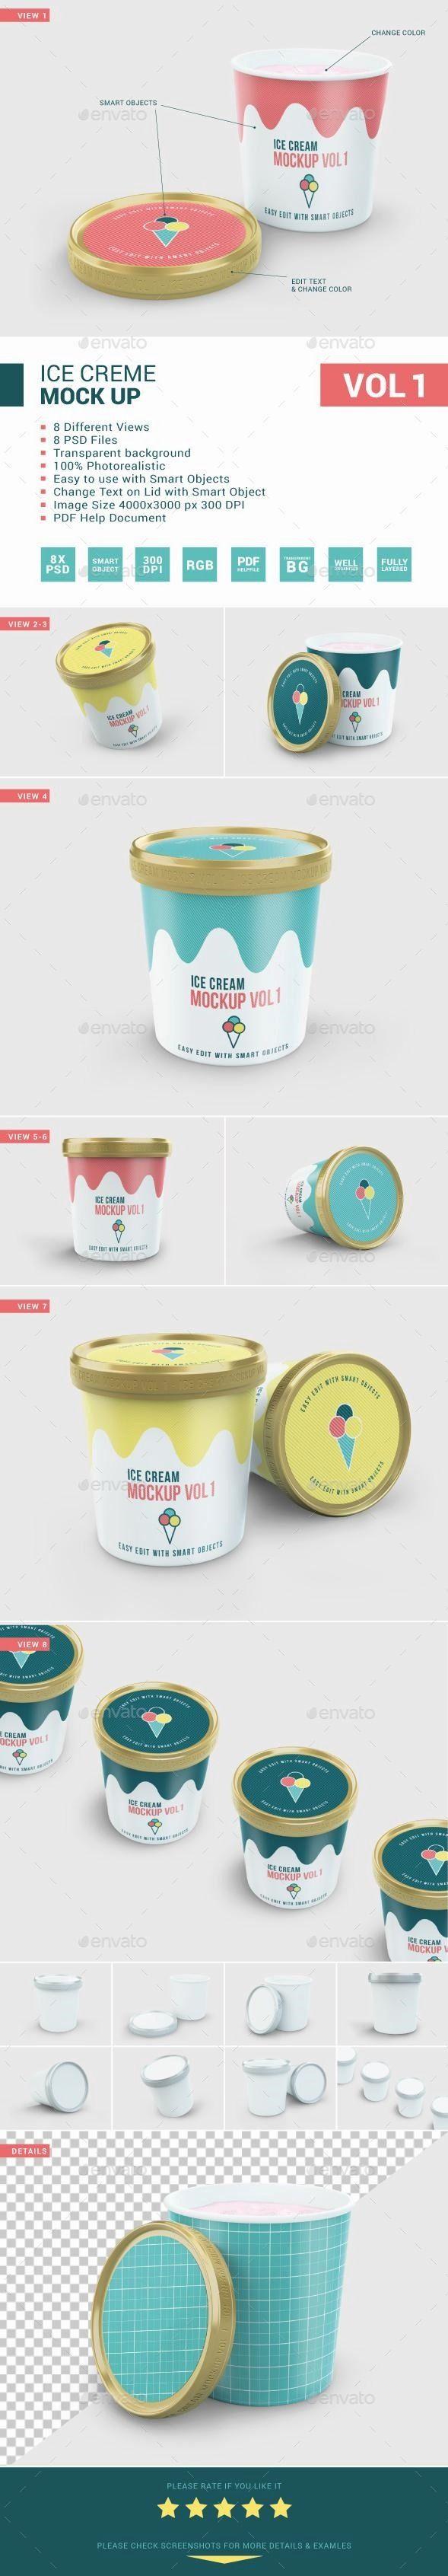 Ice Cream Package Mockup Ice Cream Packaging Yogurt Packaging Ice Cream